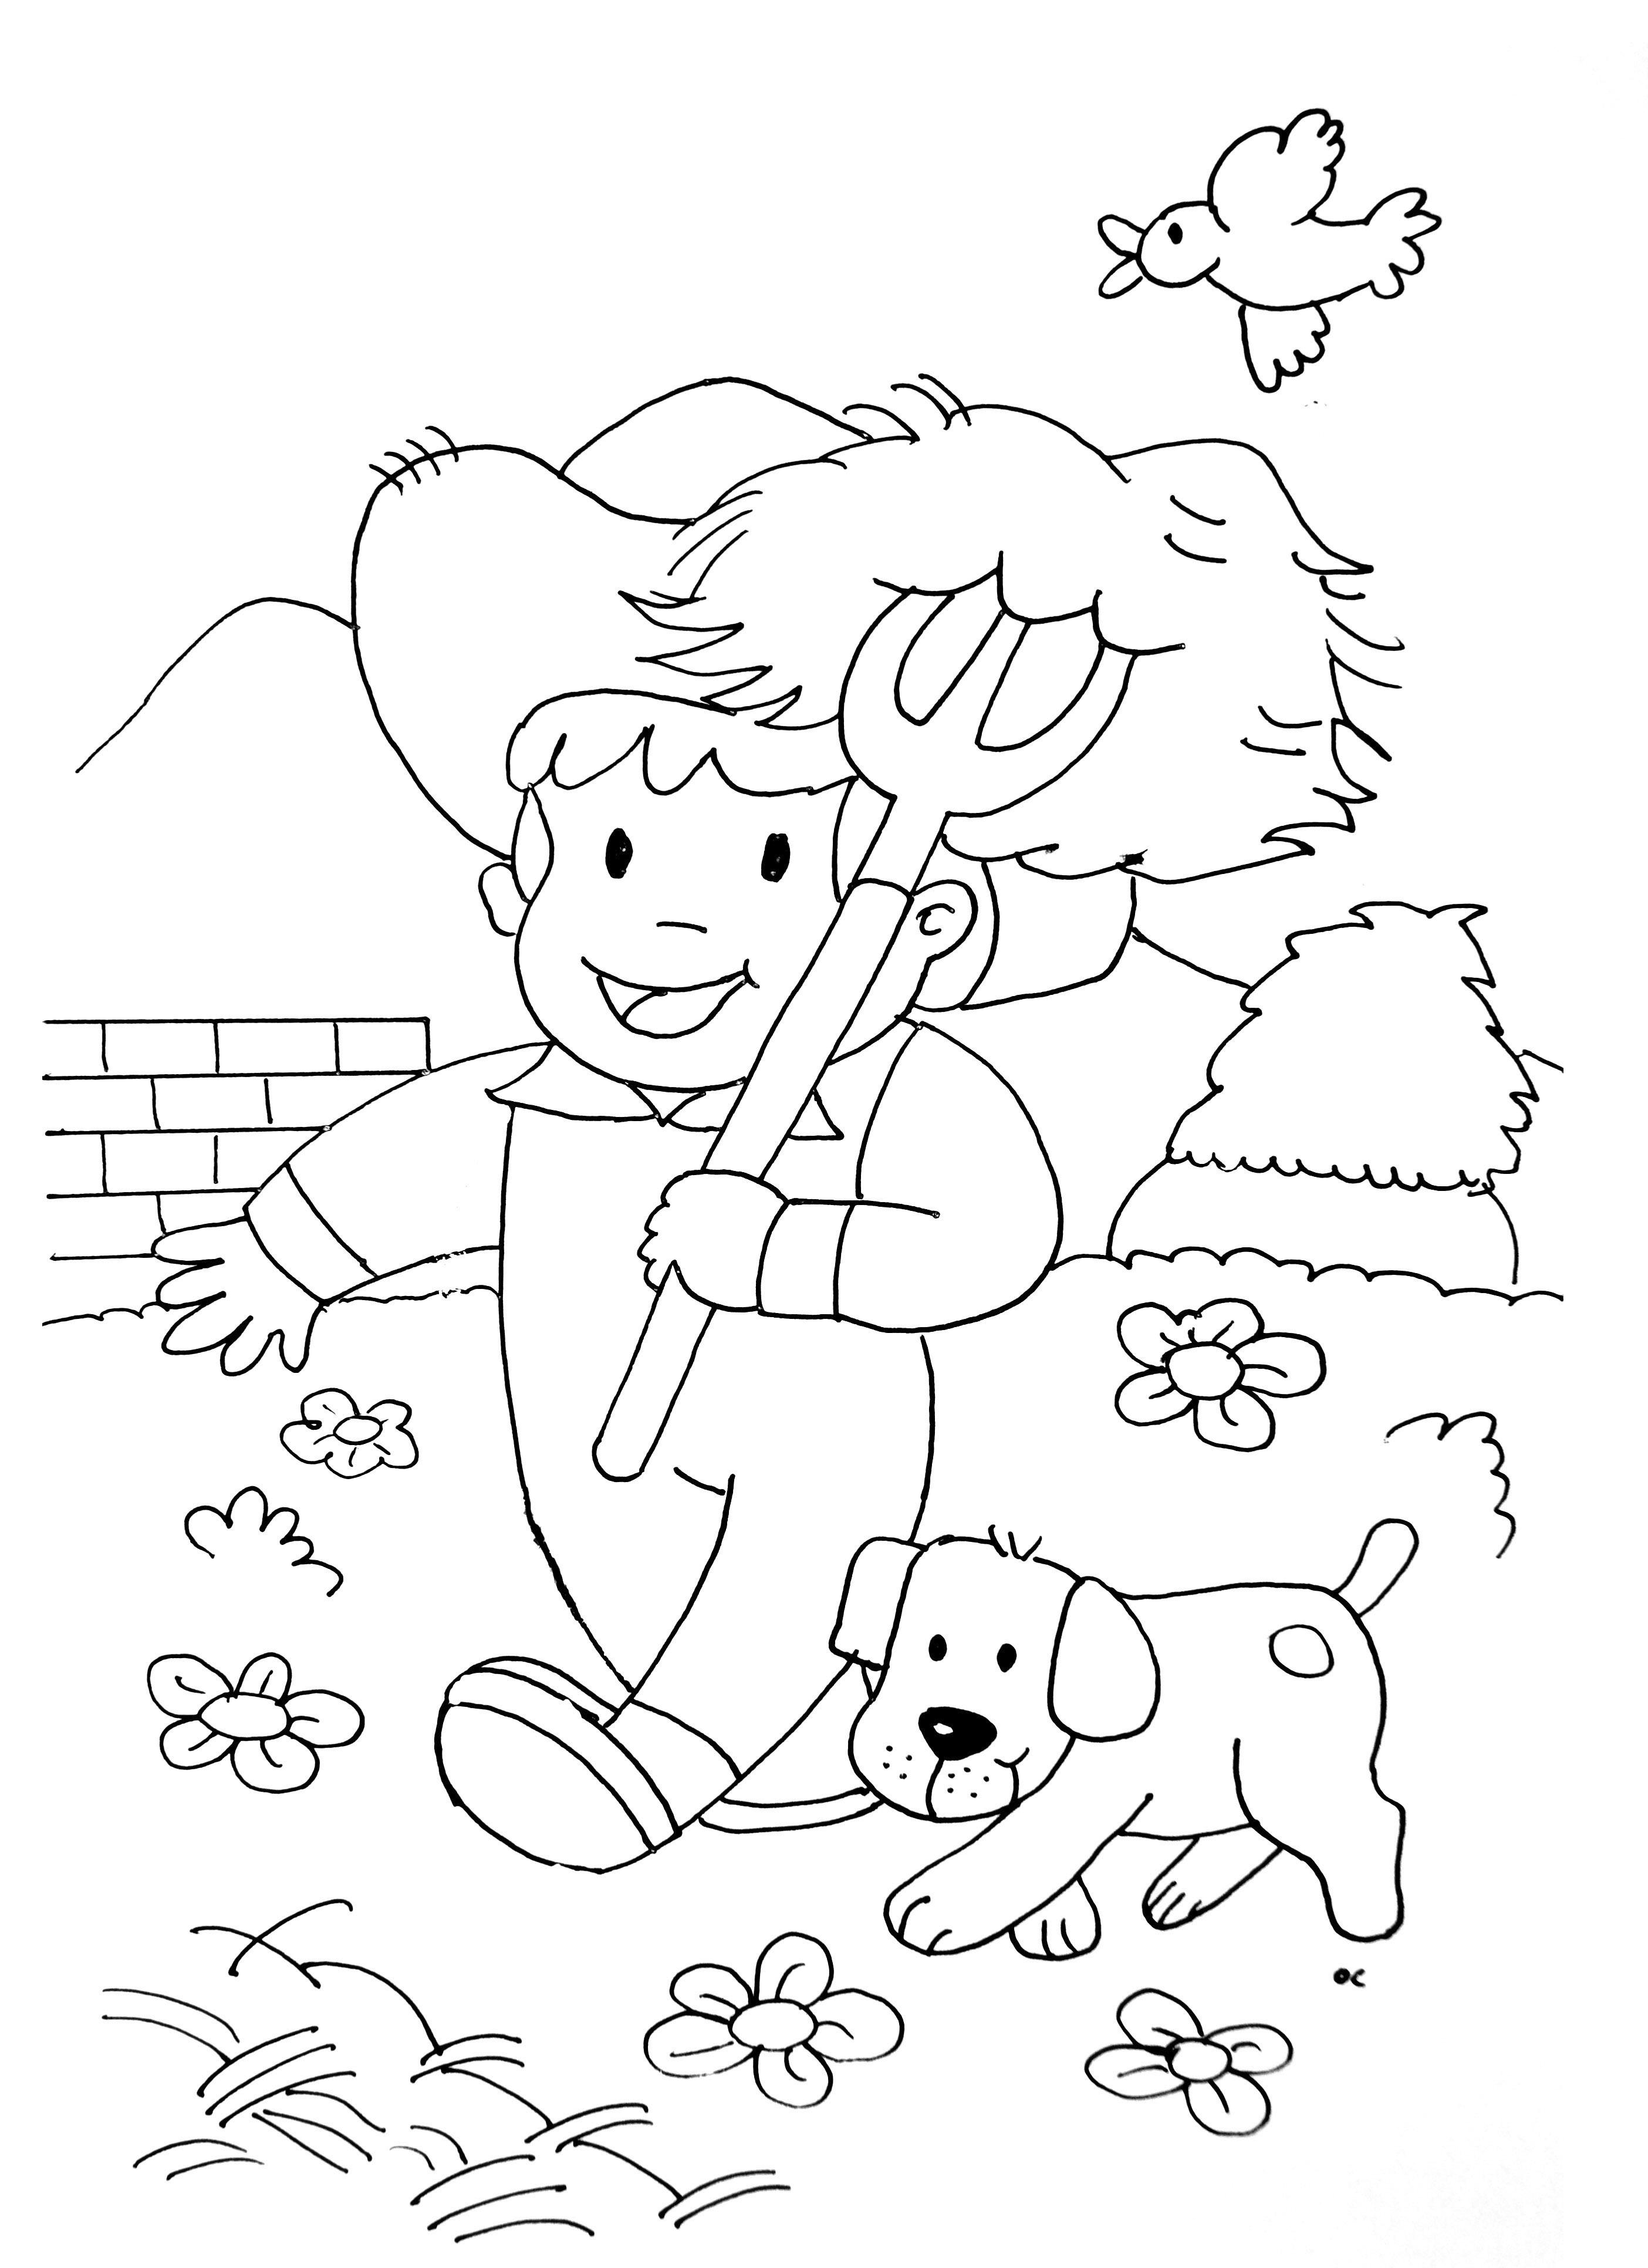 Farmer Kid With His Dog